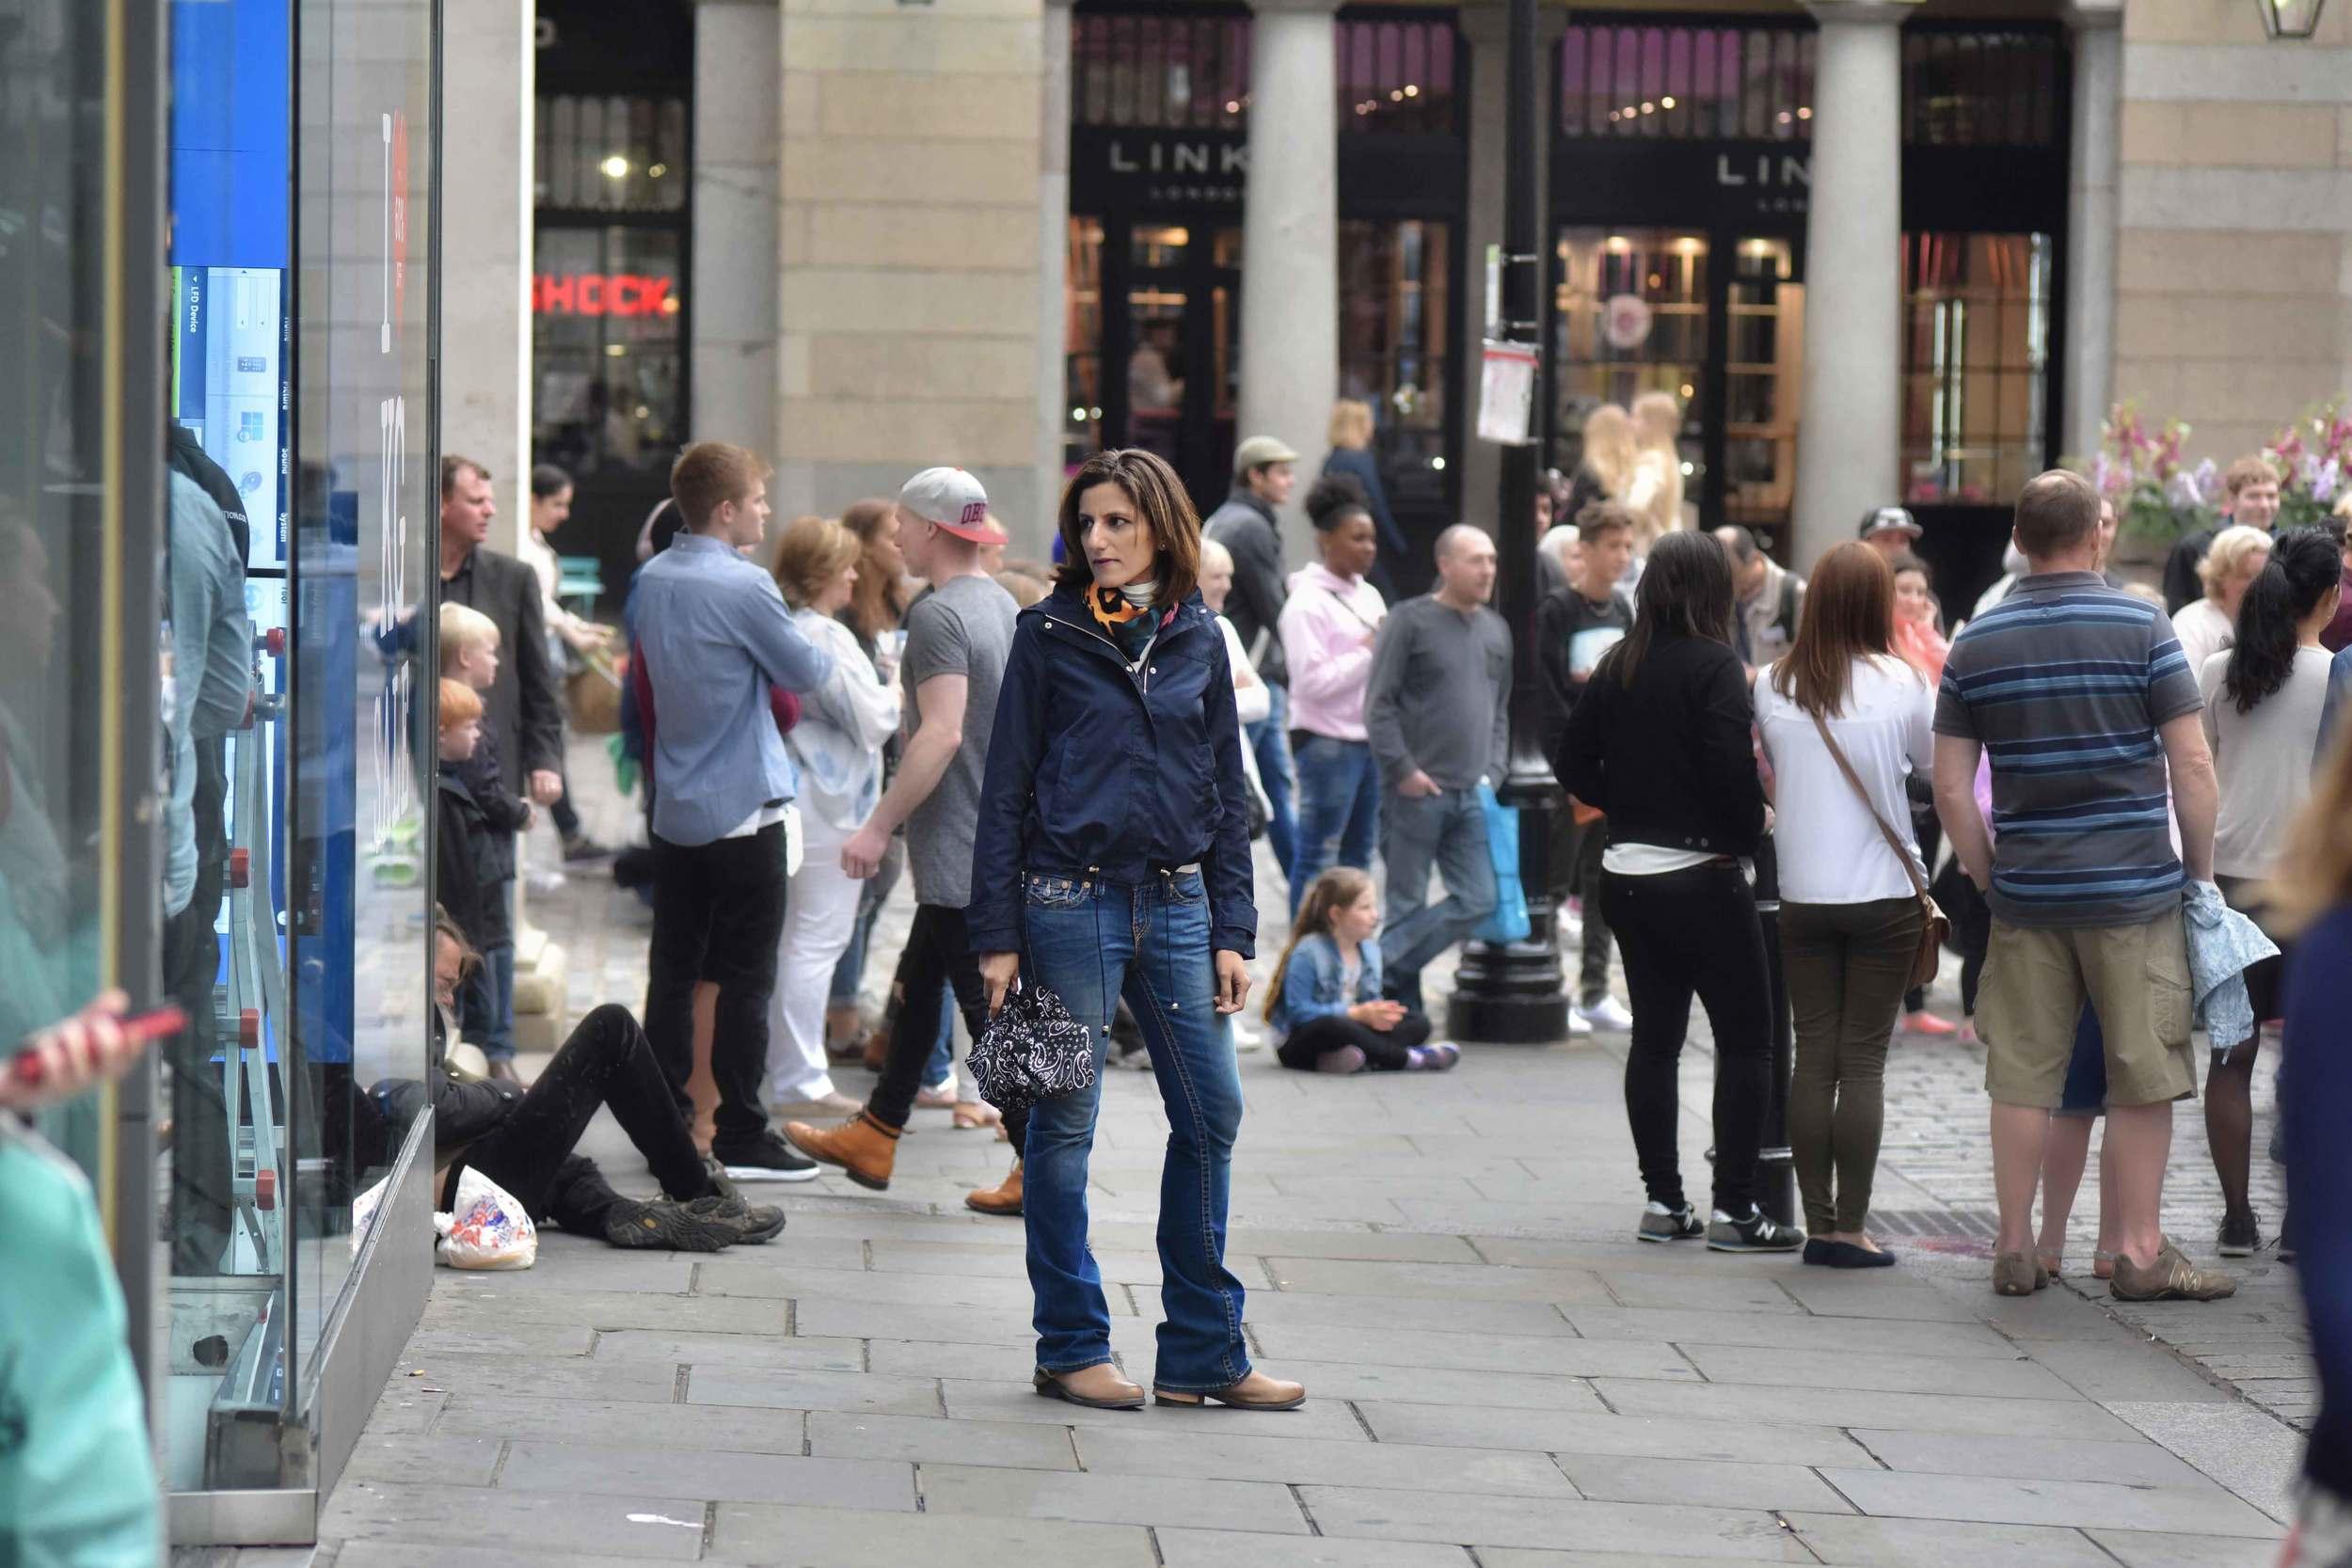 Zara water repellent jacket, Zara printed pocket square, Zara bandana print umbrella, True Religion jeans, Uggs boots, Covent Garden, London, UK. Image©sourcingstyle.com